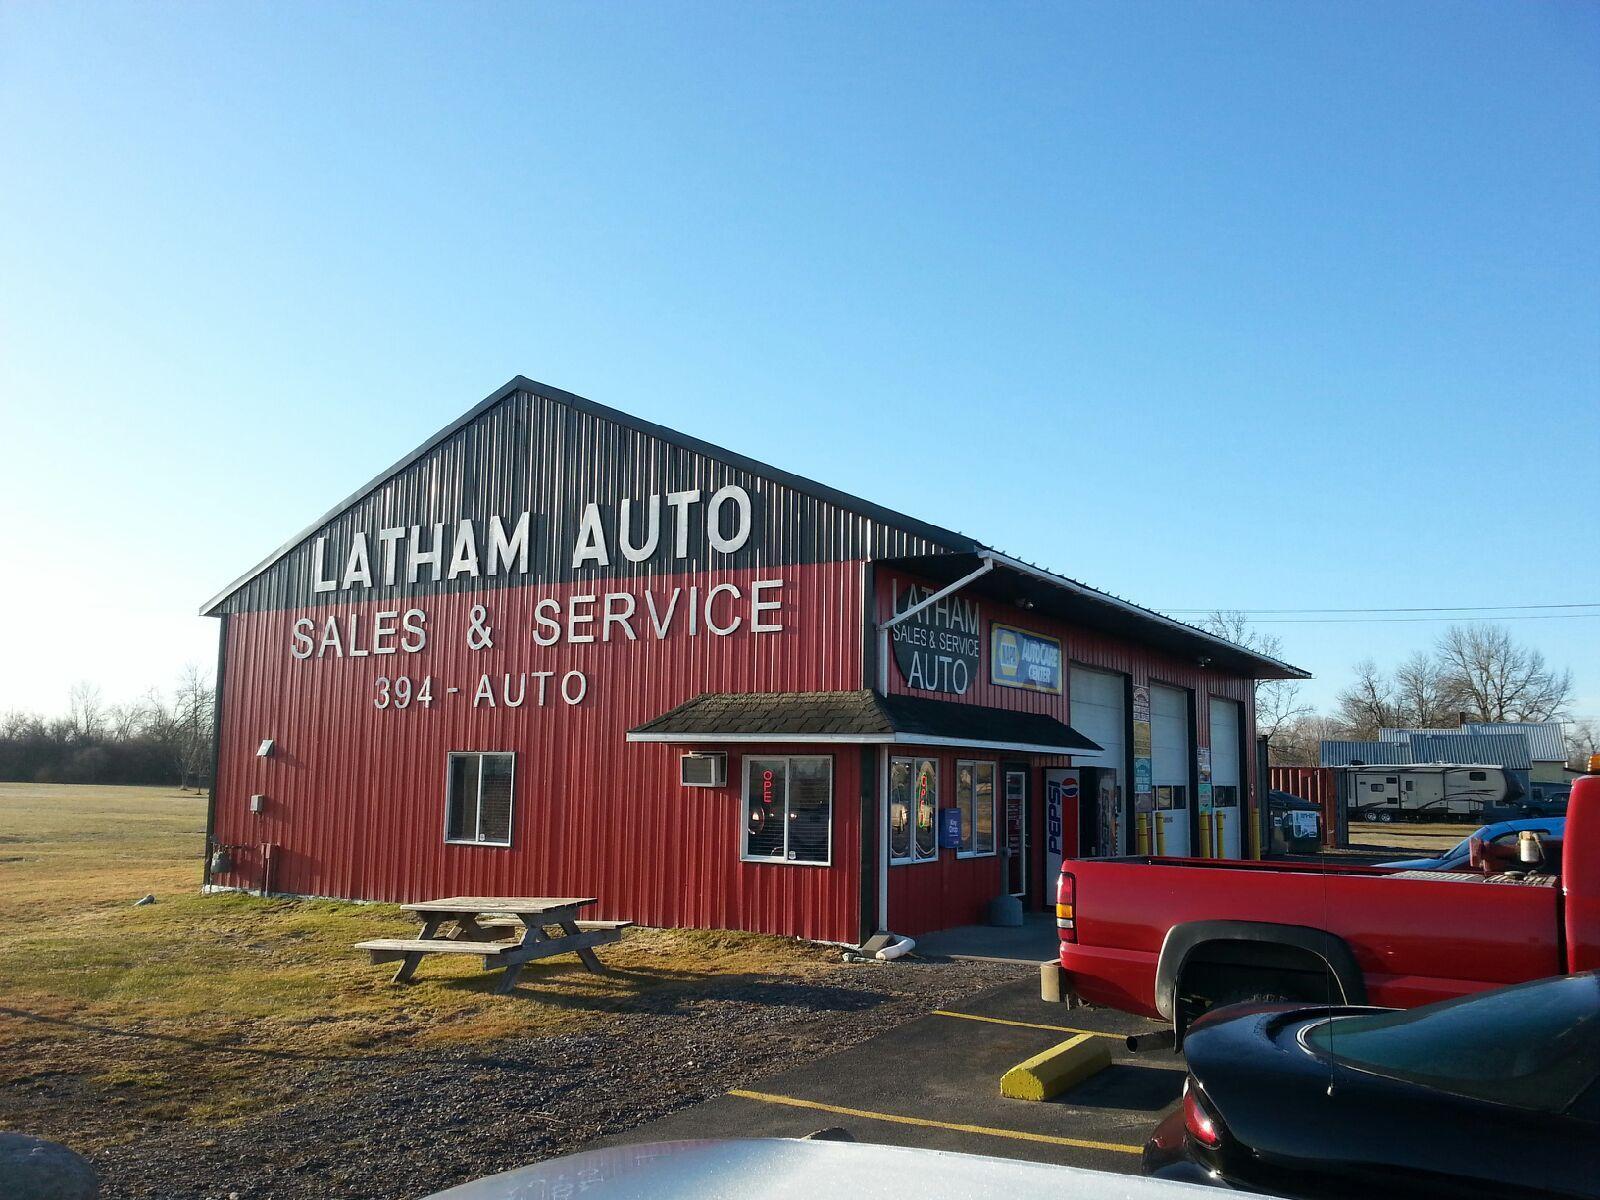 Latham Auto Sales & Service, Ogdensburg NY